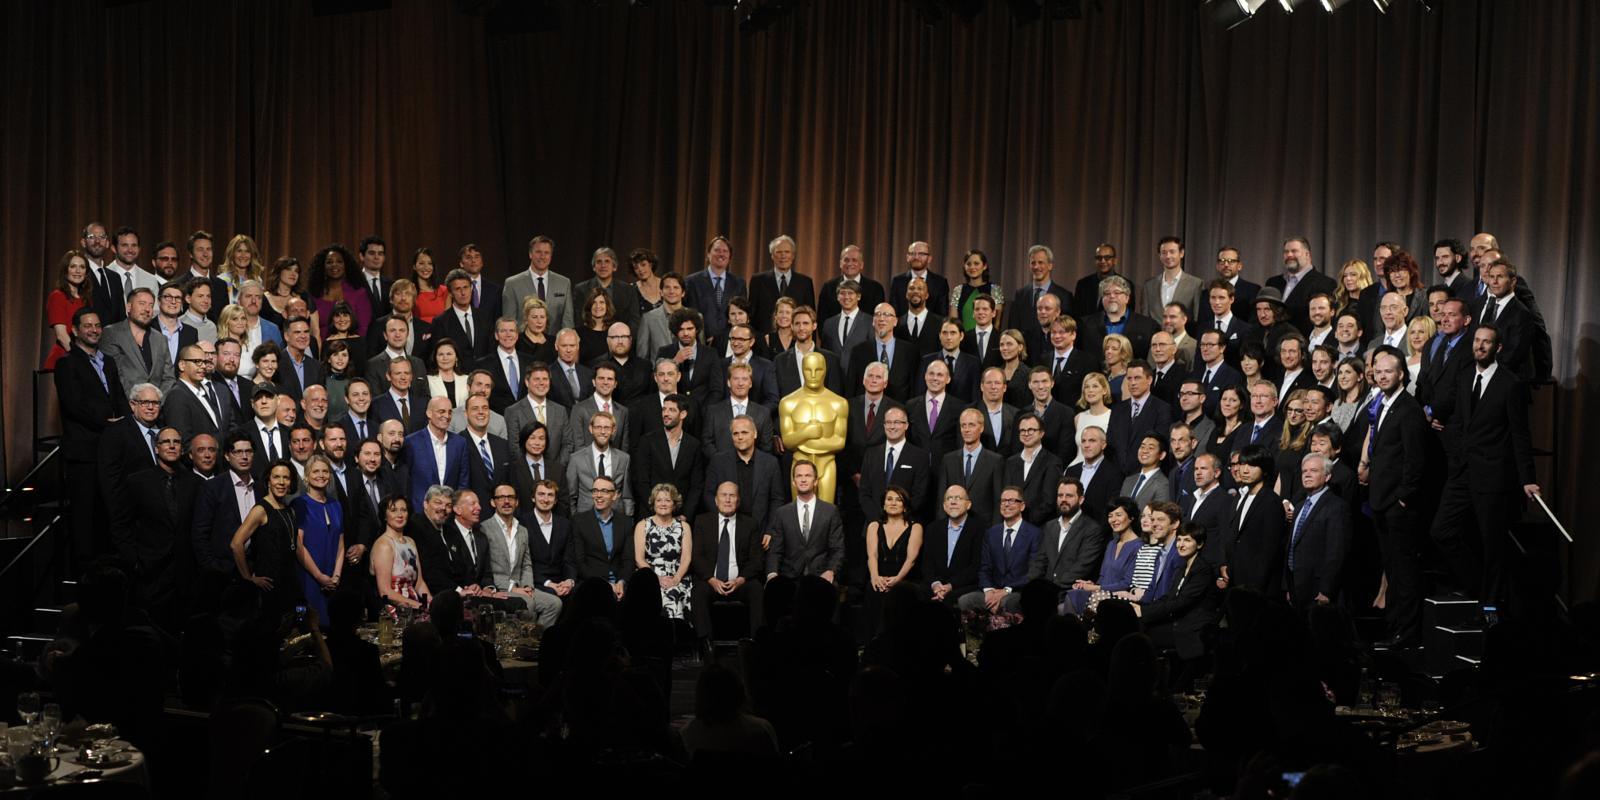 Oscar nominees class photo